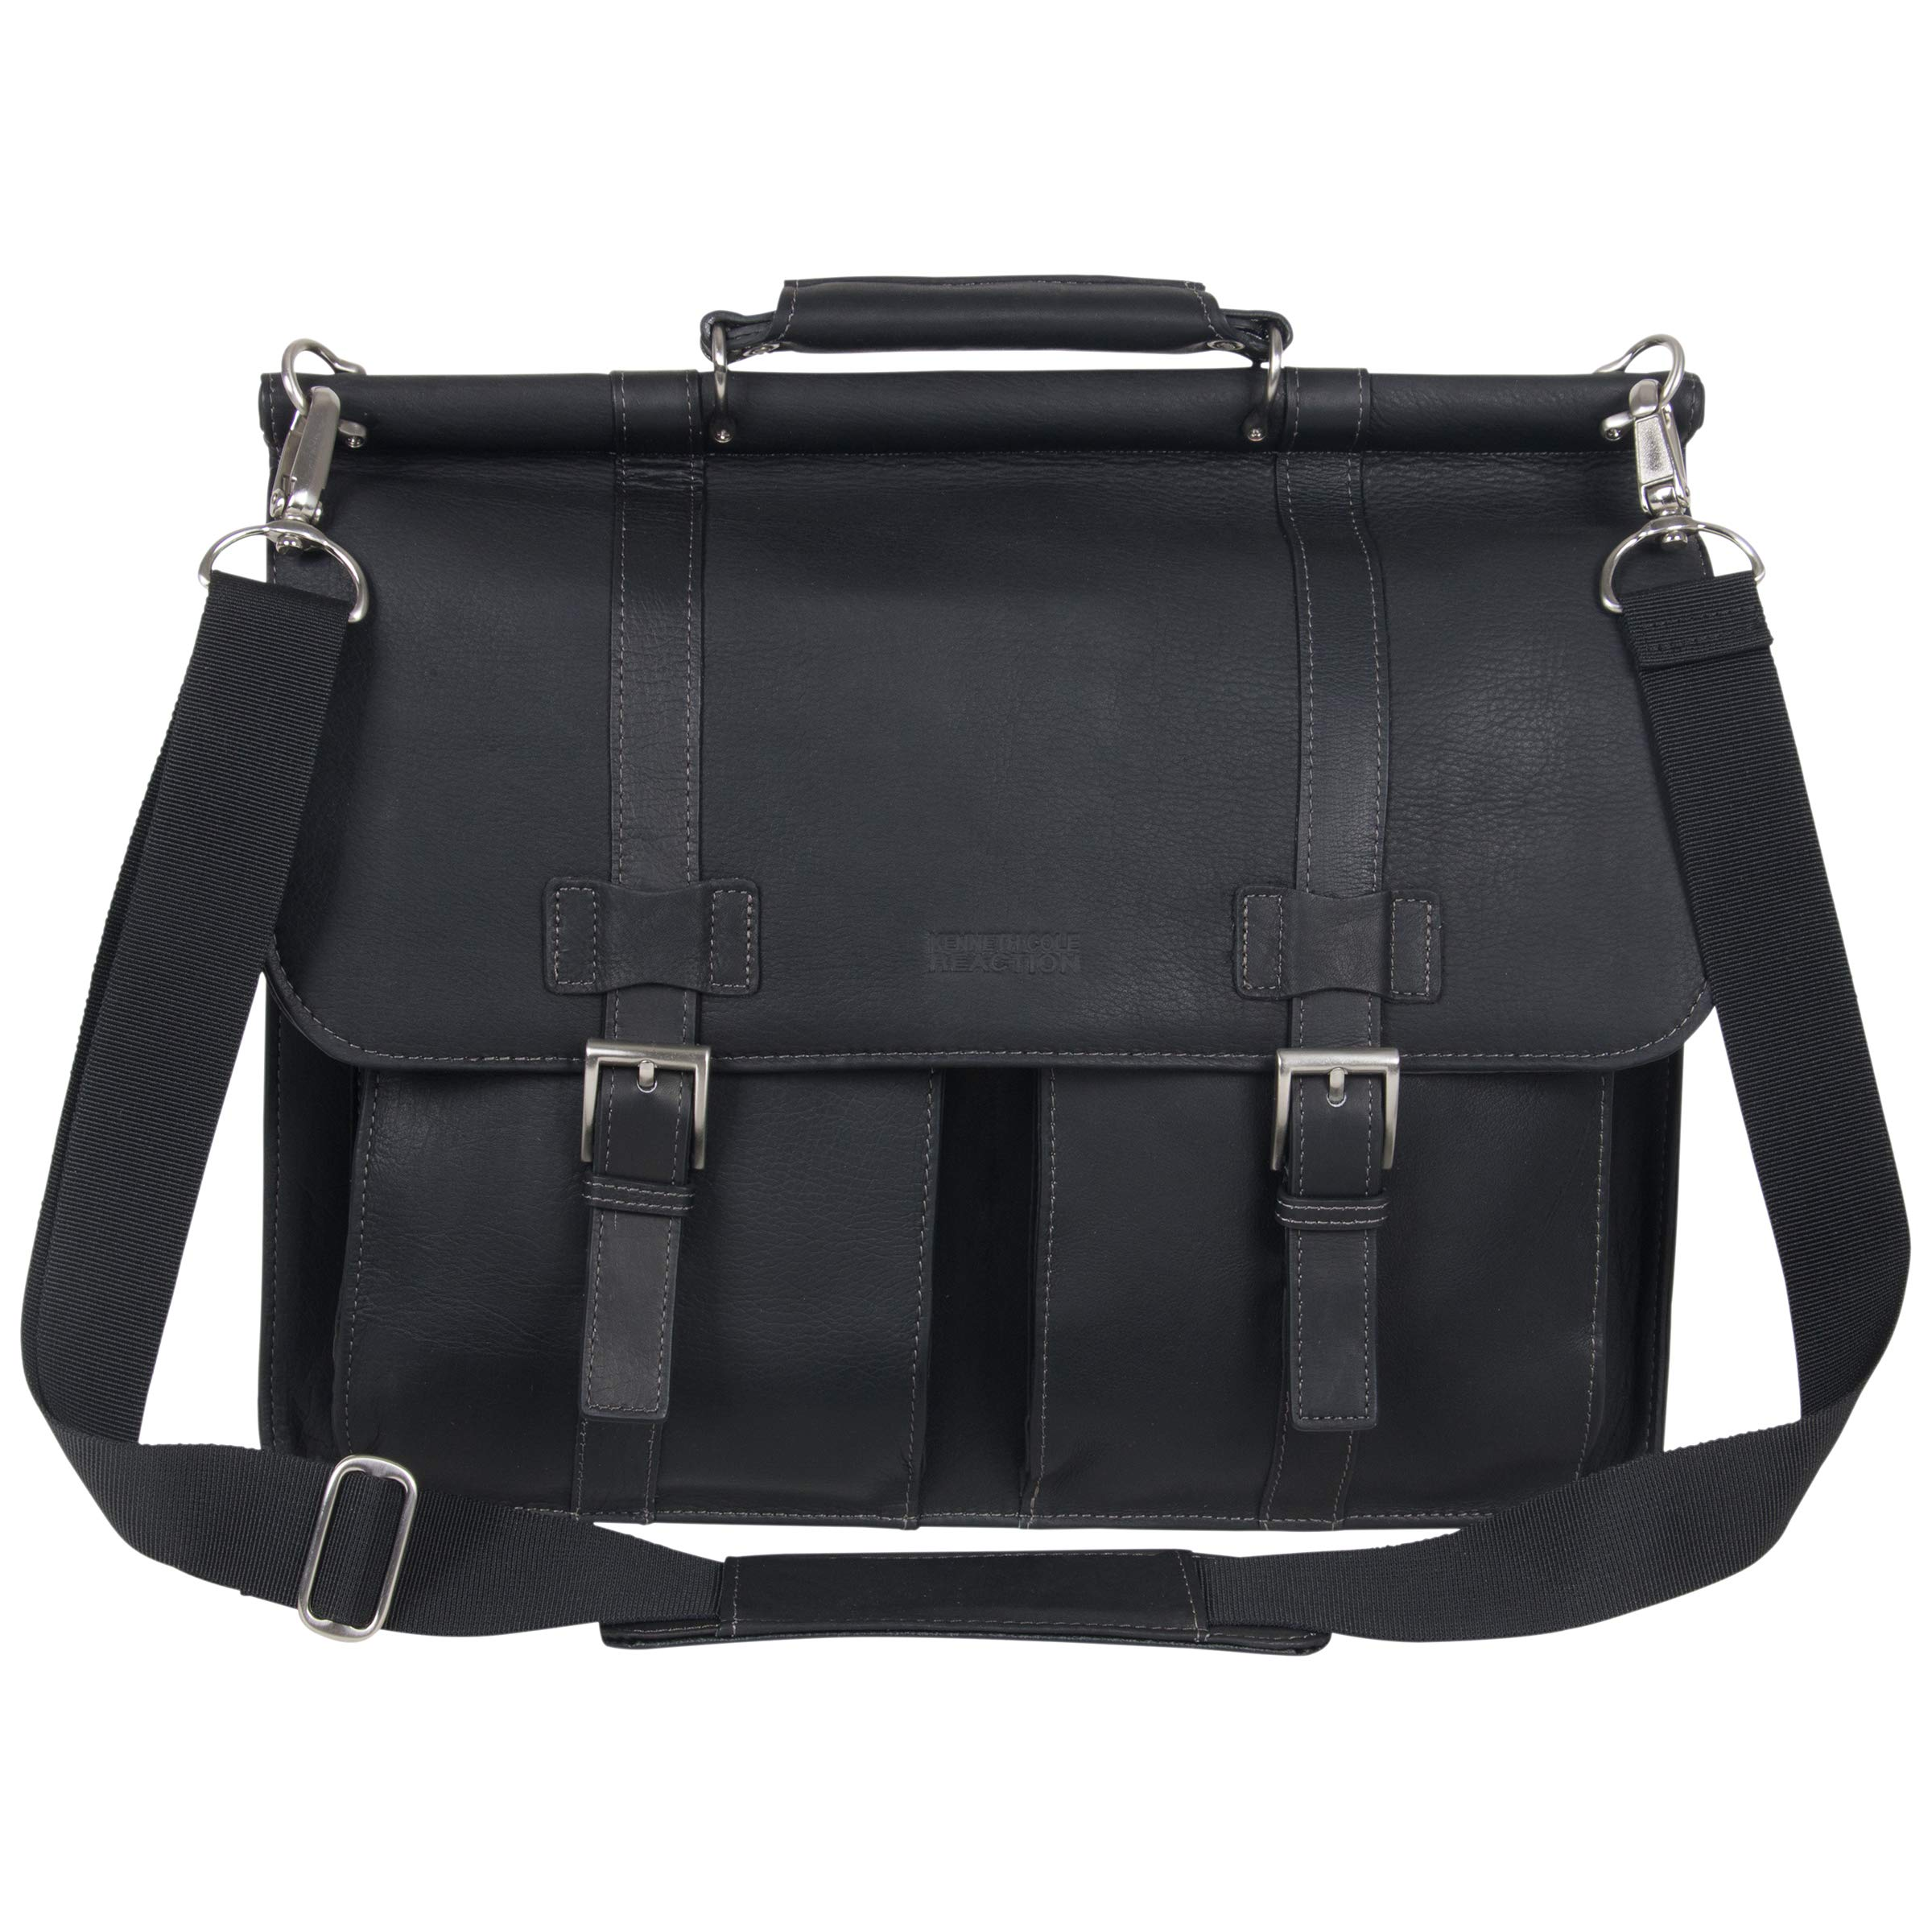 Kenneth Cole Reaction Colombian Leather Dual Compartment Flapover 15'' Laptop Dowelrod Business Portfolio, Black